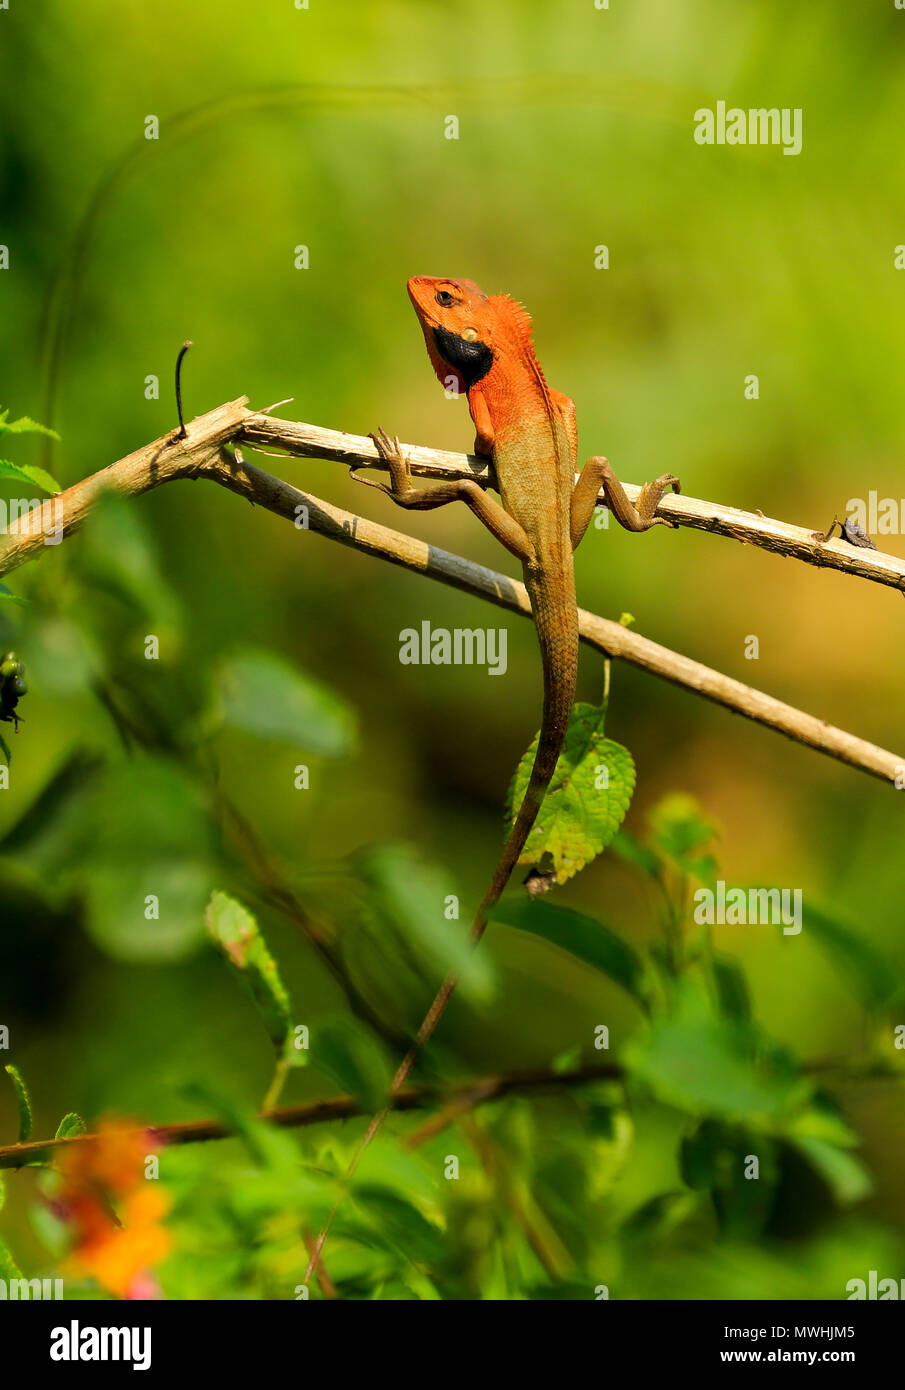 Common garden lizard, eastern garden lizard or changeable lizard (Calotes versicolor), Satchari National Park, Habiganj, Bangladesh - Stock Image